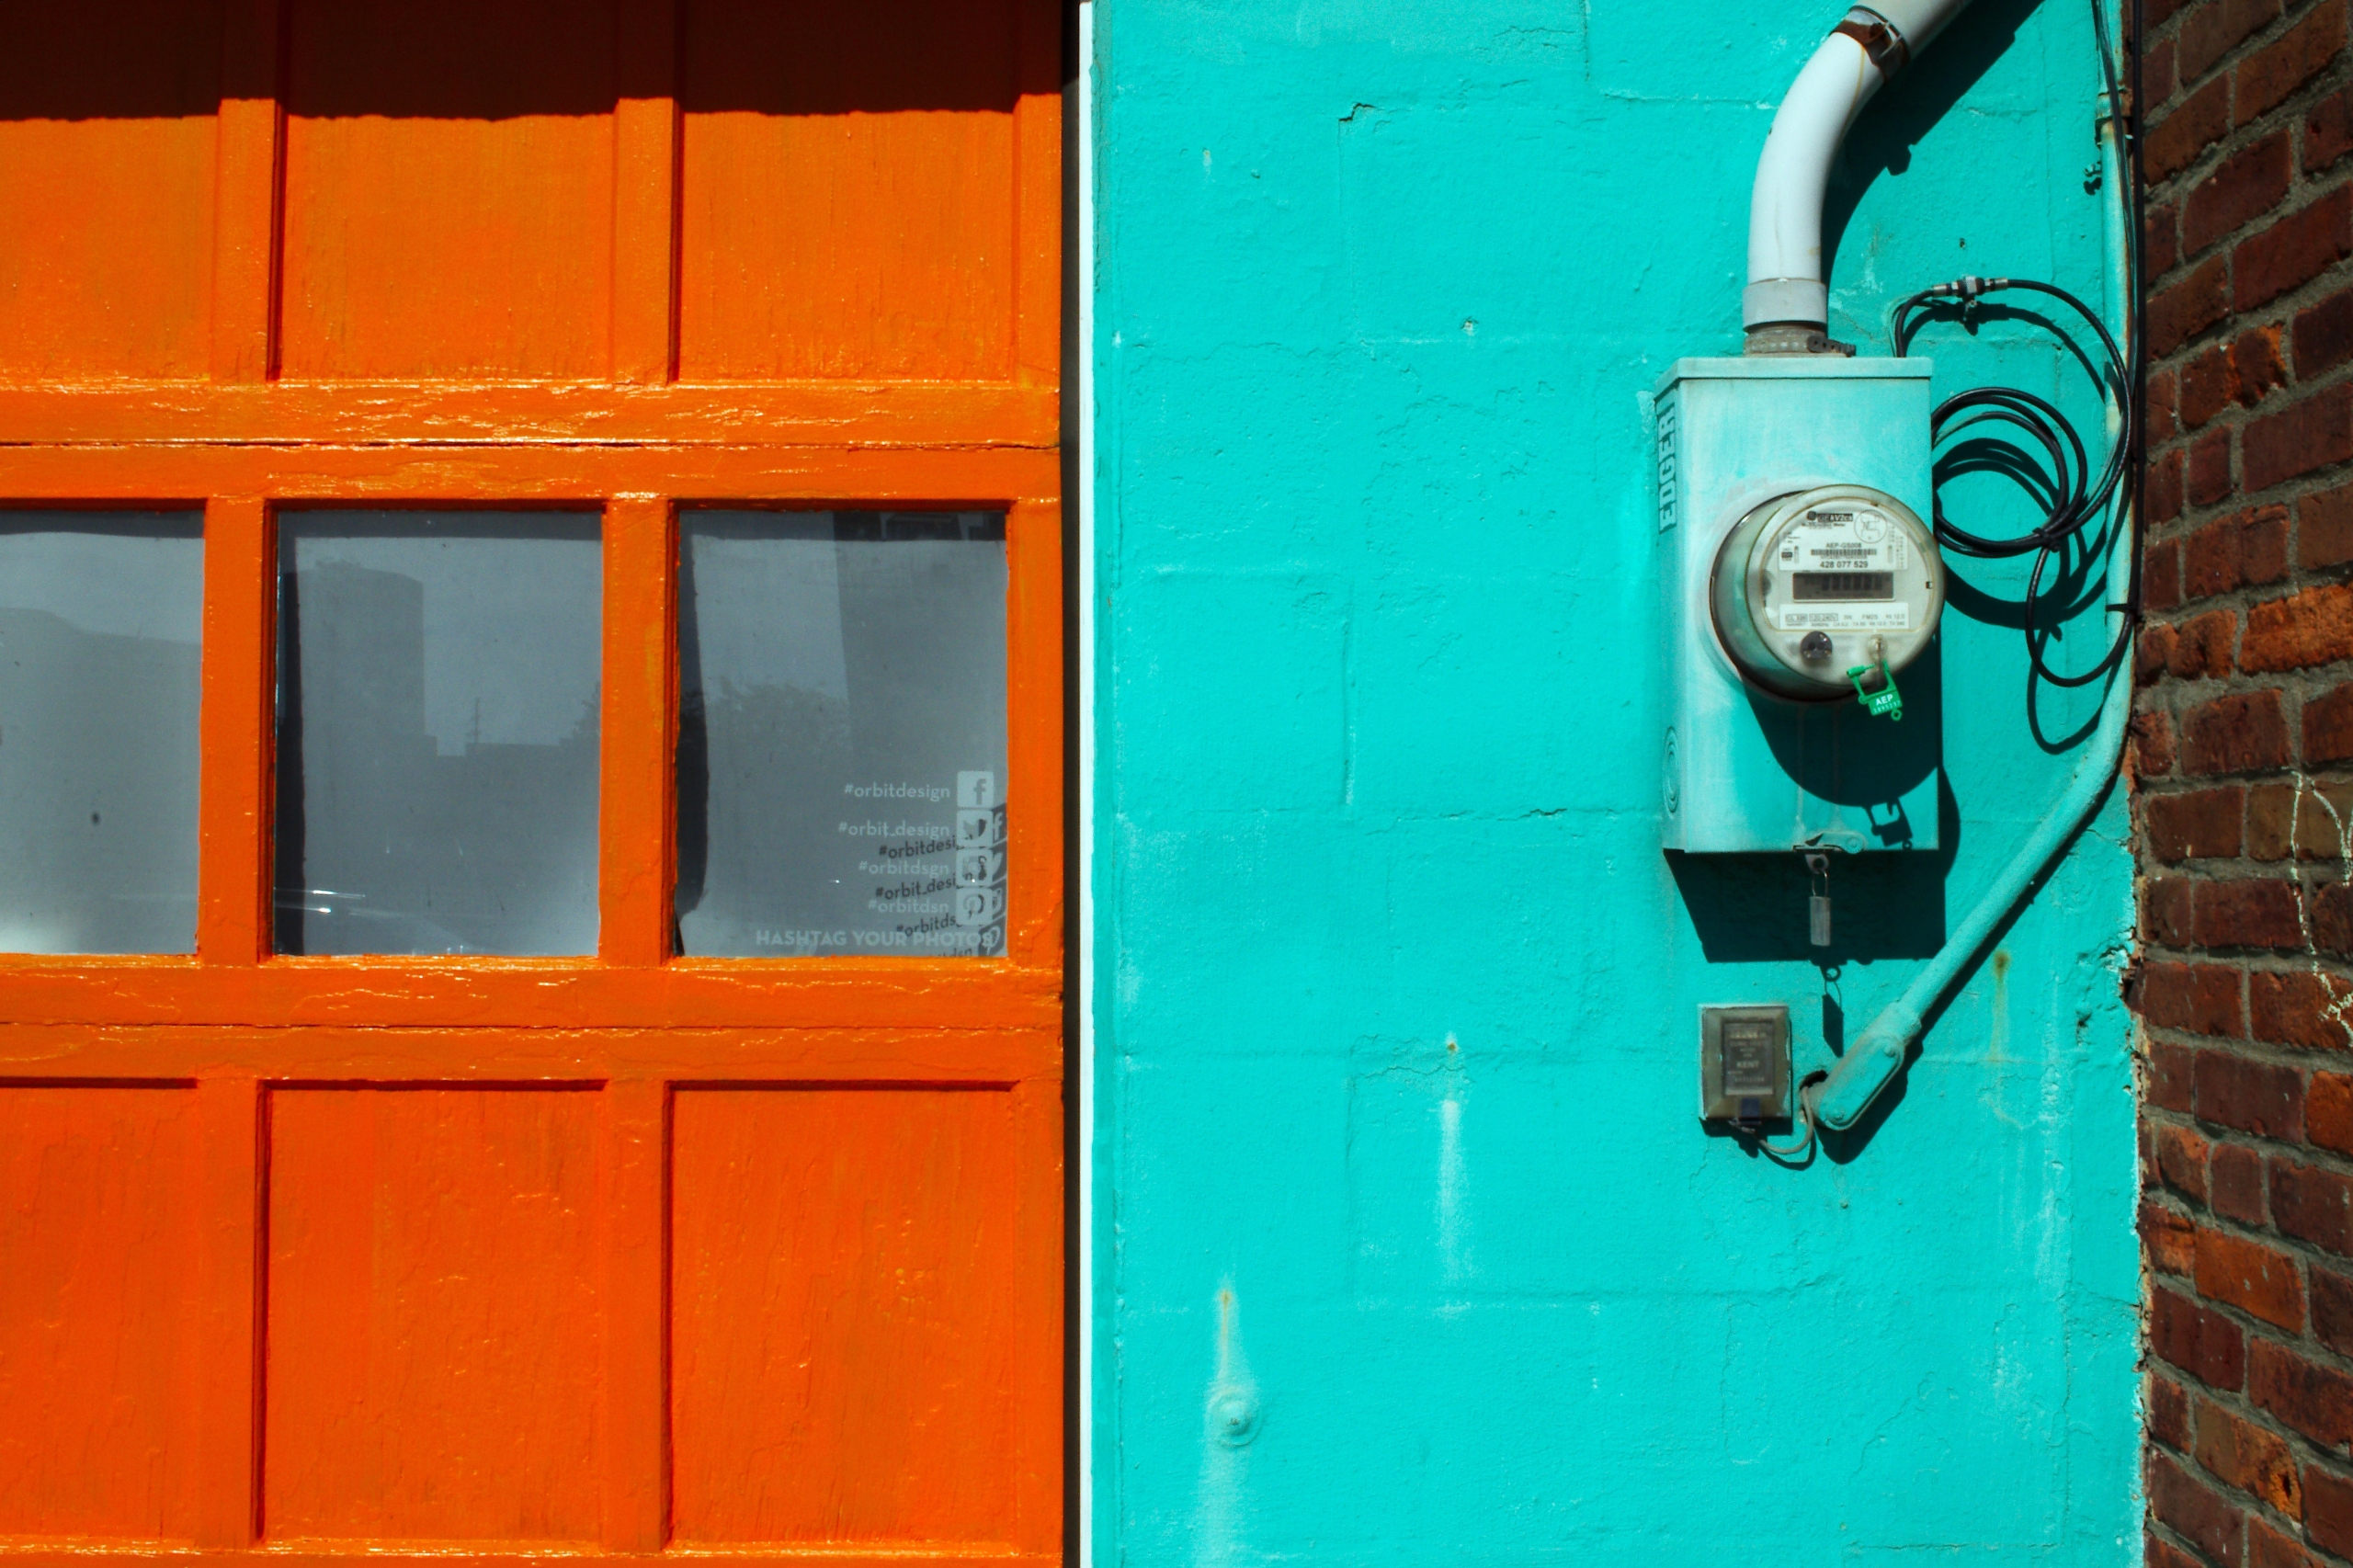 Orange Door - photography, architecture - chetkresiak   ello